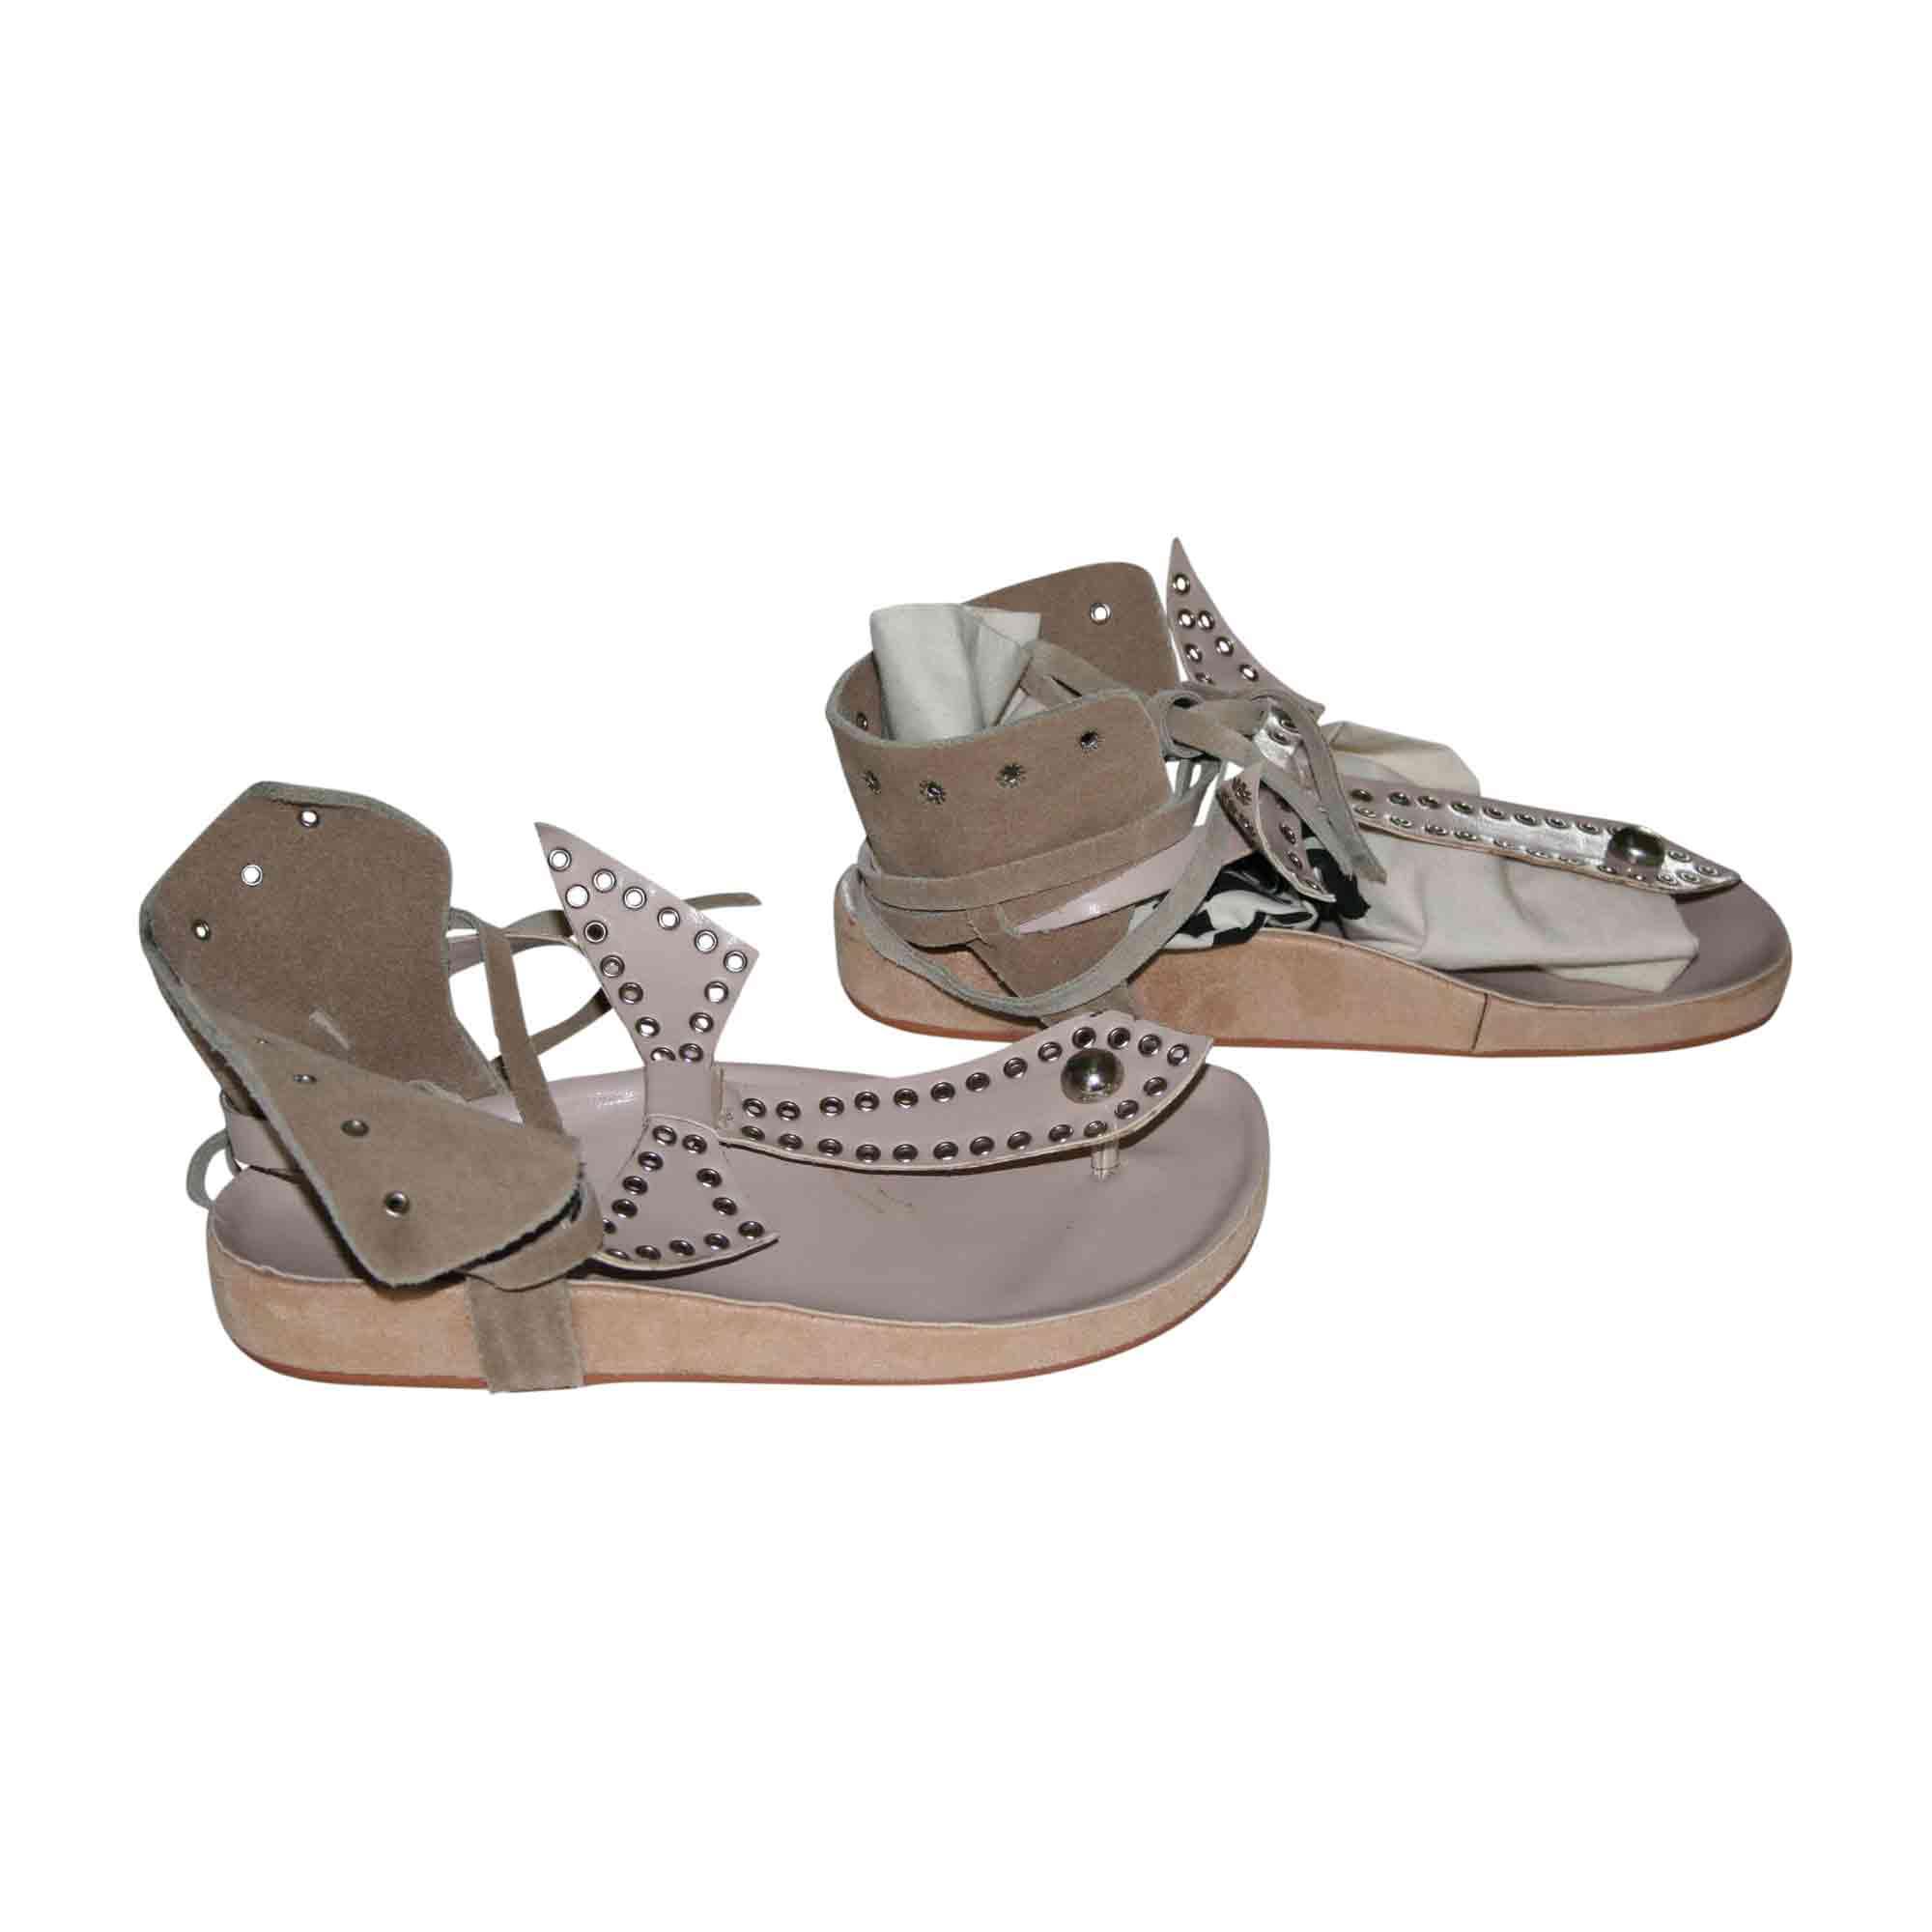 Flat Sandals ISABEL MARANT Beige, camel